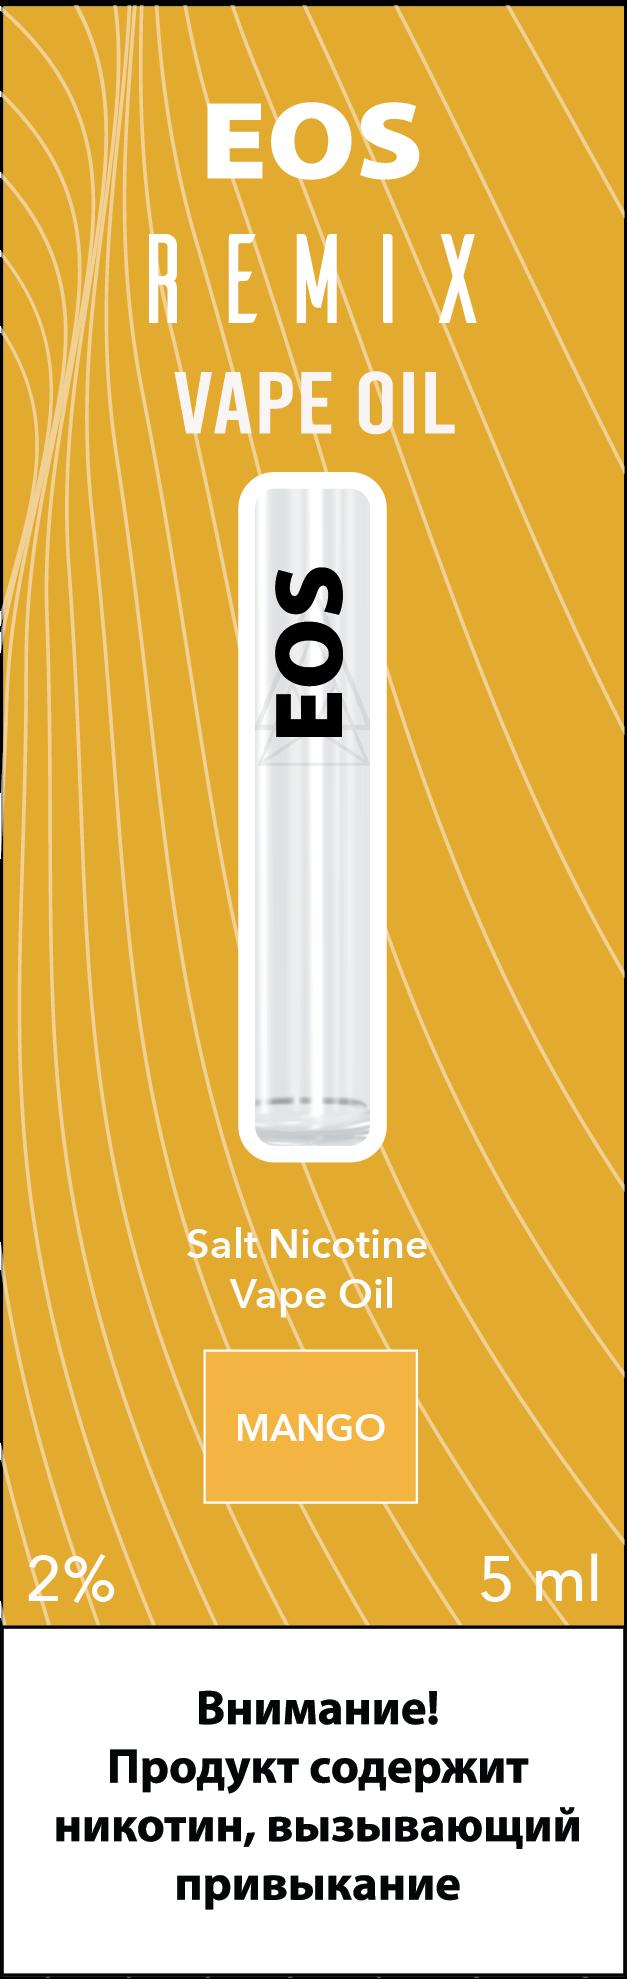 EOS REMIX SALT NIC MANGO 2% 5ml